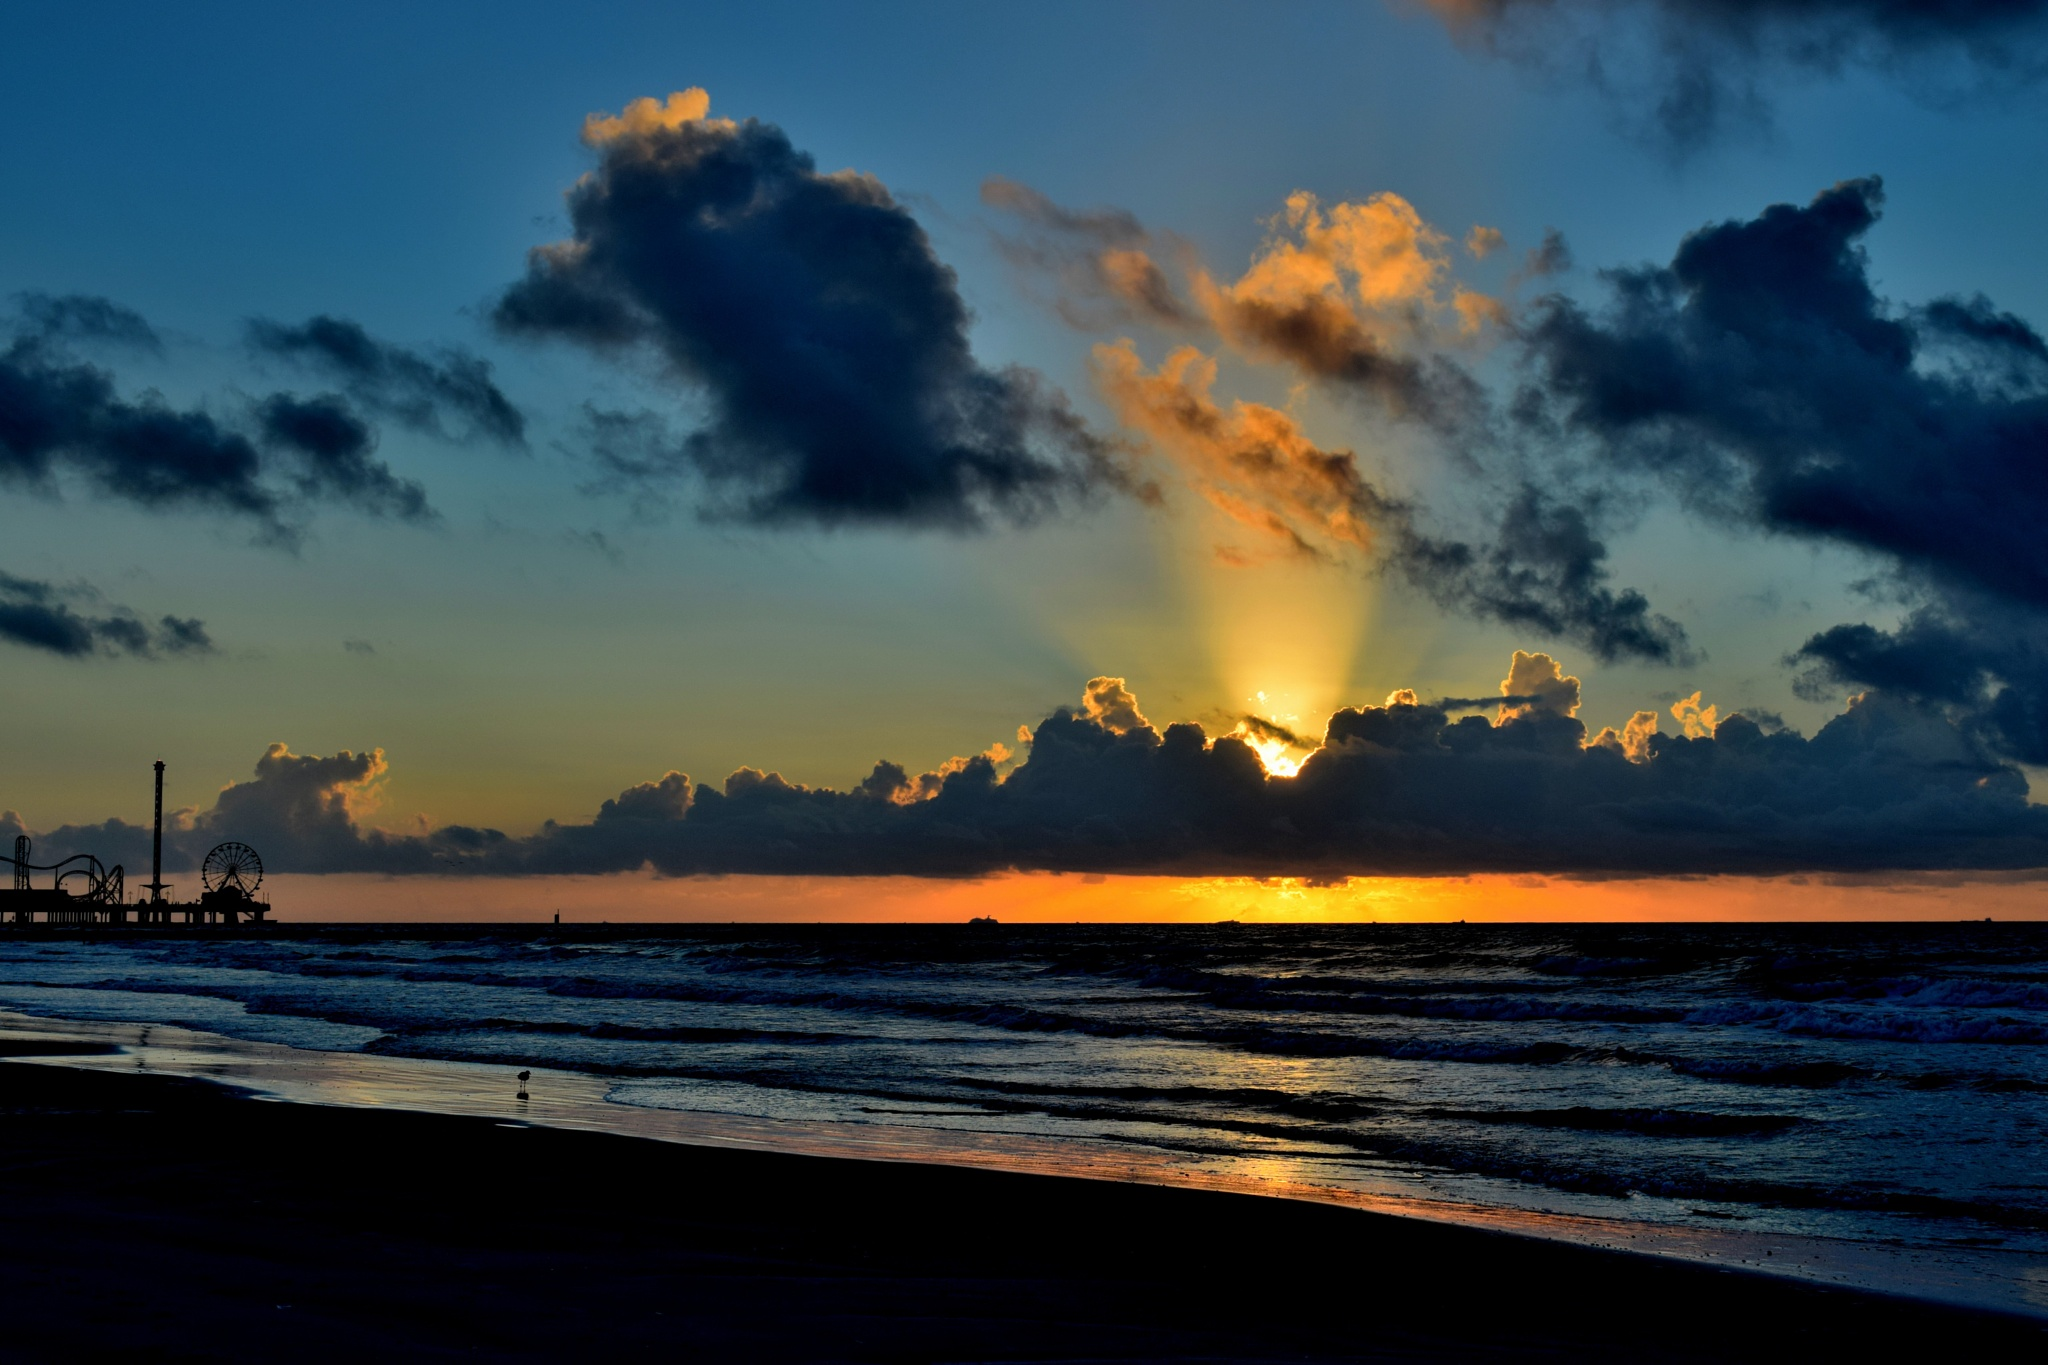 Galveston Tx 525~Sunrise Thru The Clouds by Lawrence Scott Hess